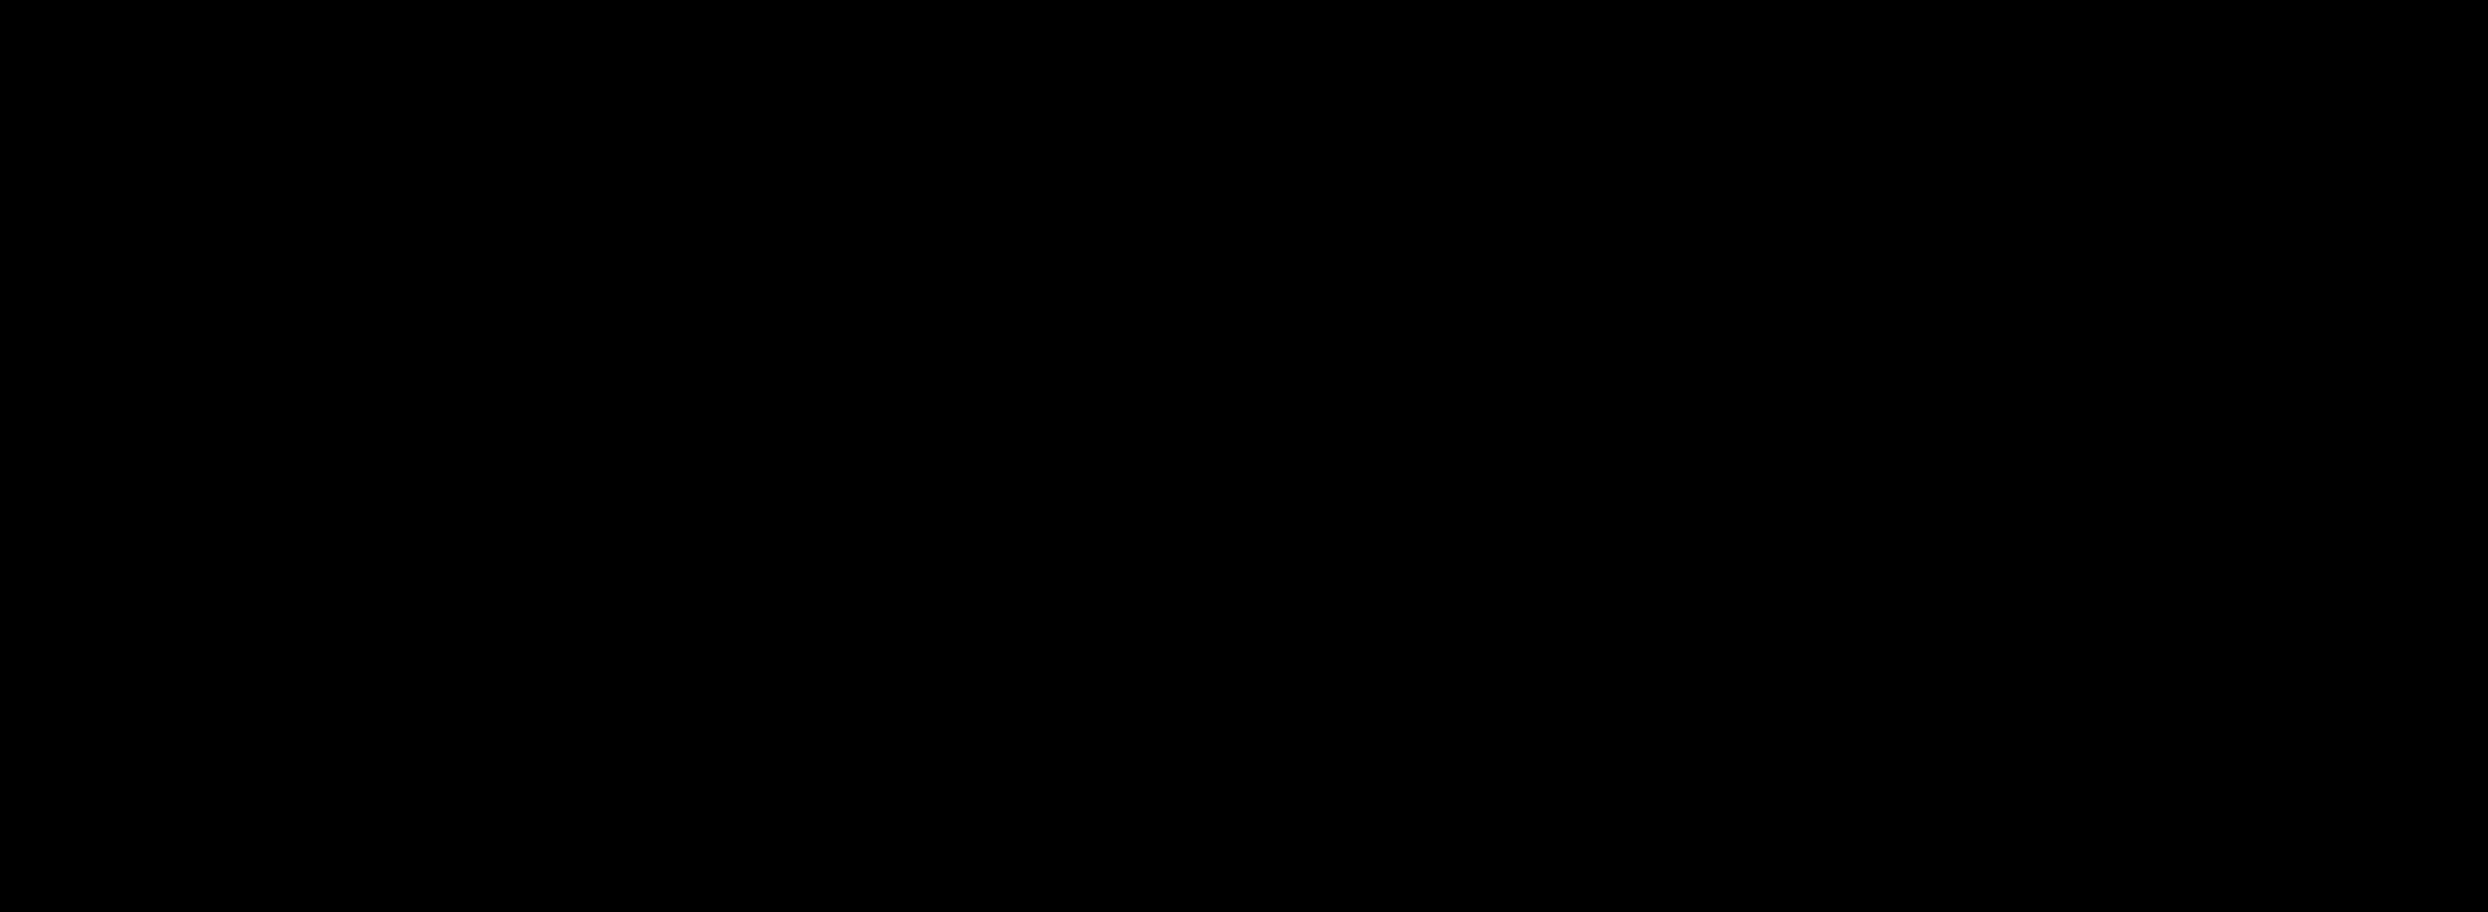 china shelf Clipart illustration in PNG, SVG